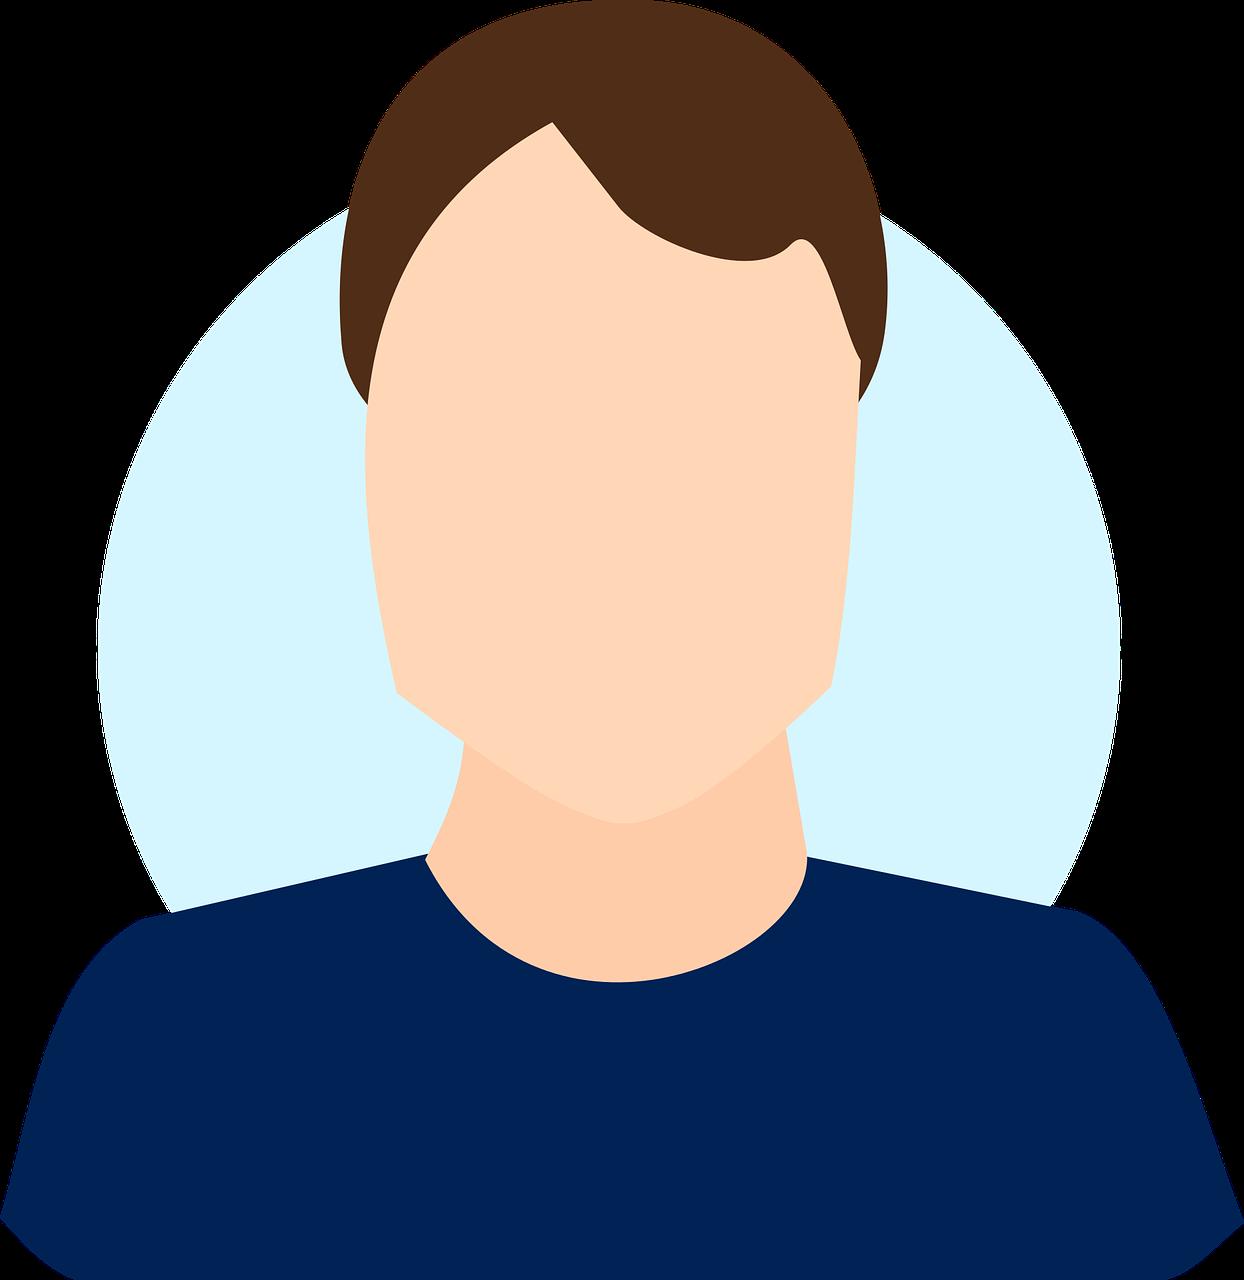 profile, man, male